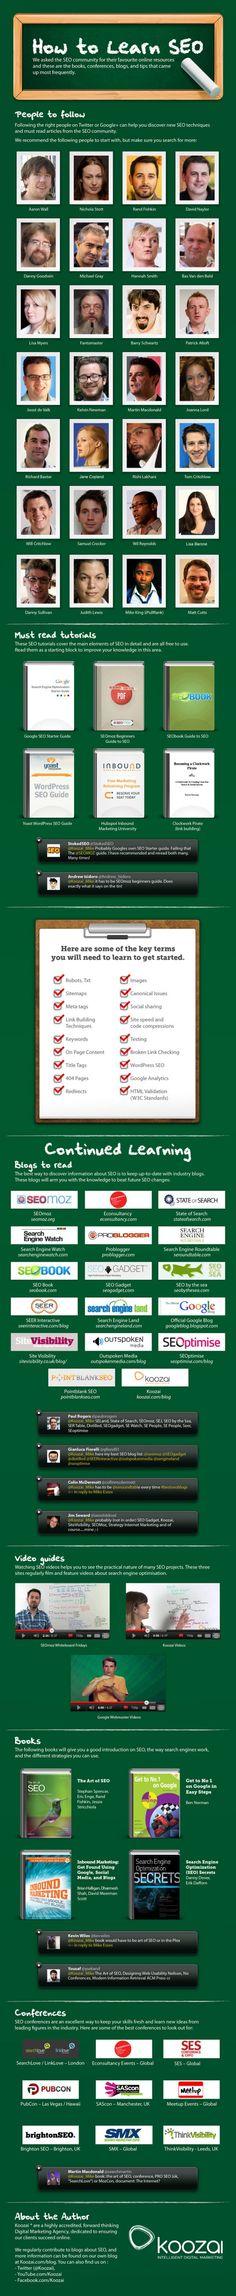 how to learn SEO / 94 maneras sencillas de aprender SEO #infografia #infographic #seo